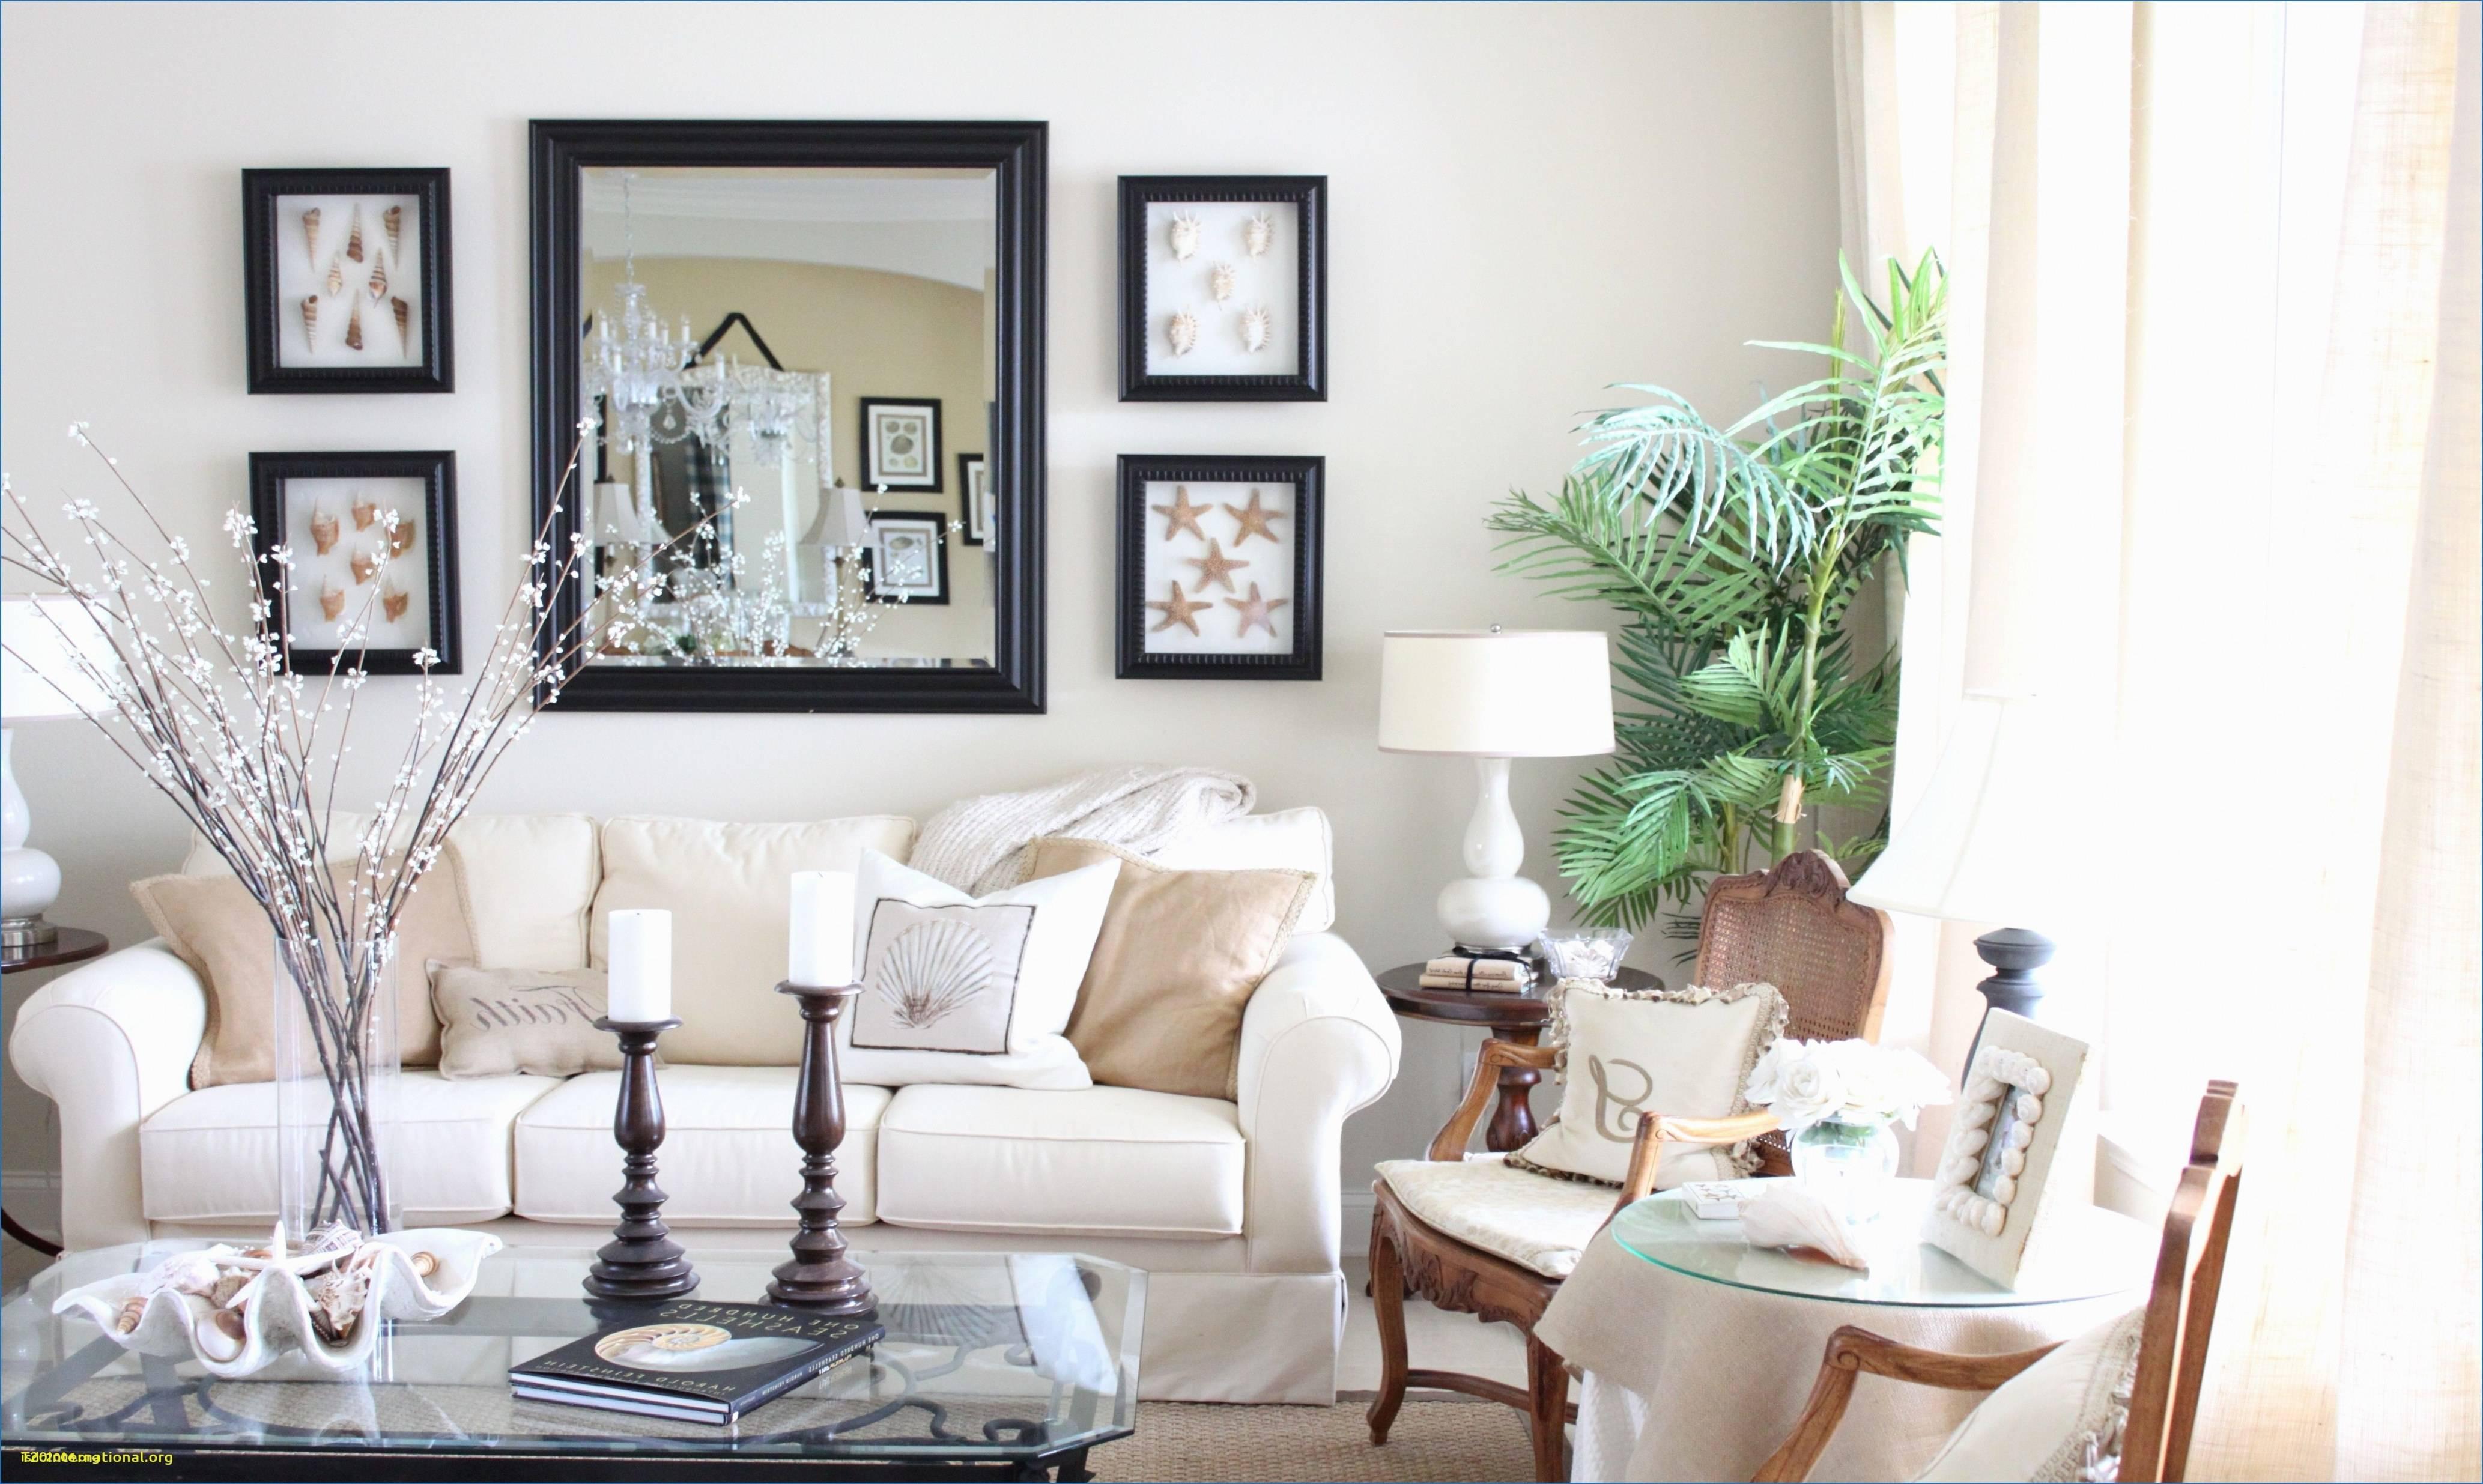 living room wall decor ideas living room luxury wall paint ideas for small living room of living room wall decor ideas